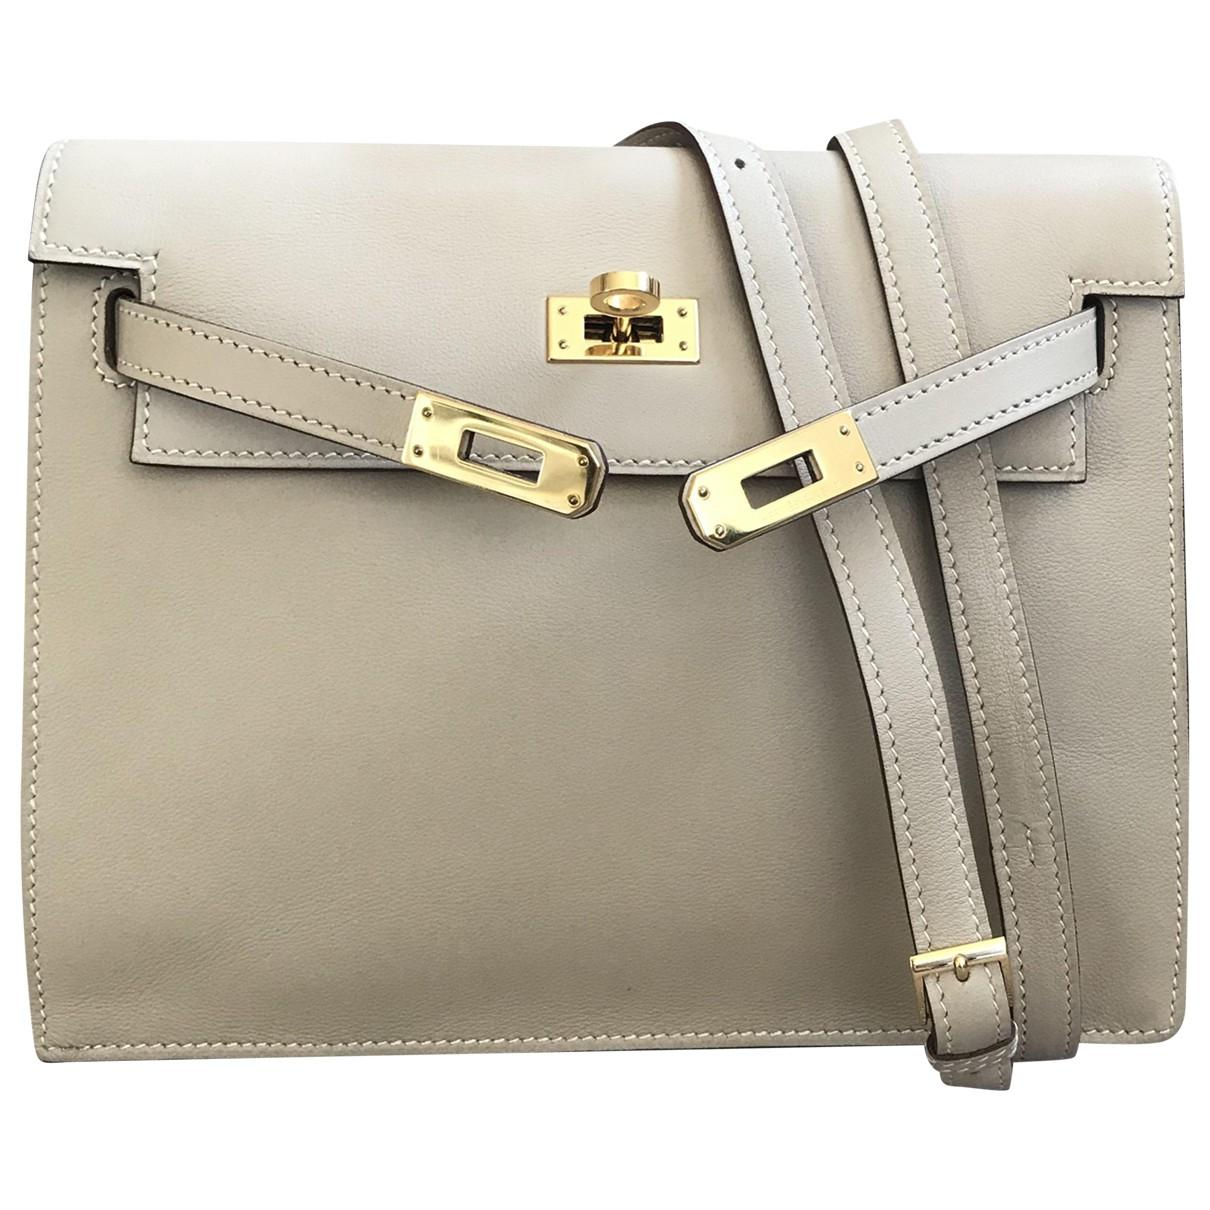 38c6d6054335 Hermès Pre-owned Kelly Danse Leather Crossbody Bag in Natural - Lyst